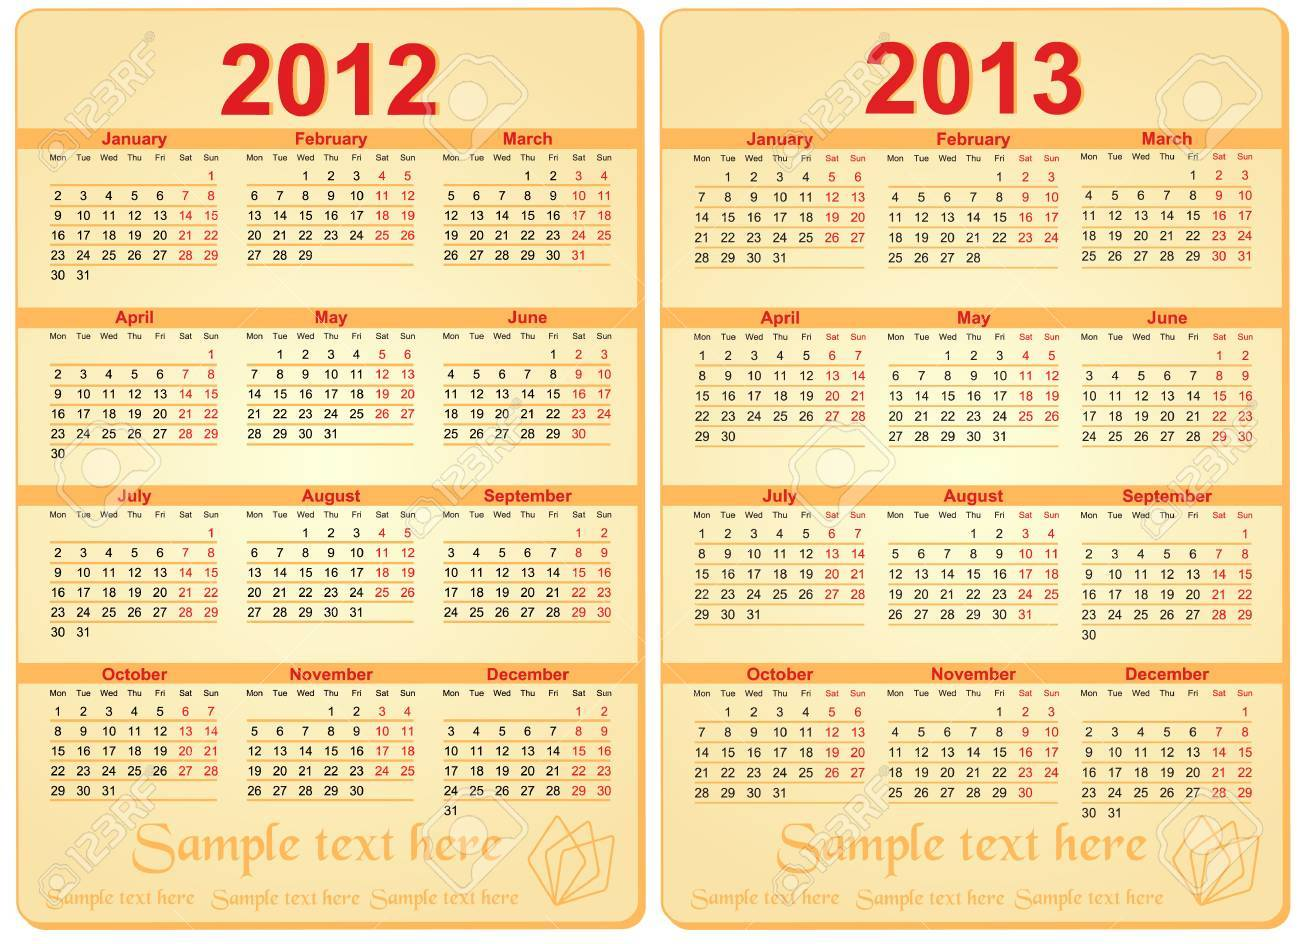 Set of 2012 and 2013 Calendar Stock Vector - 10277938